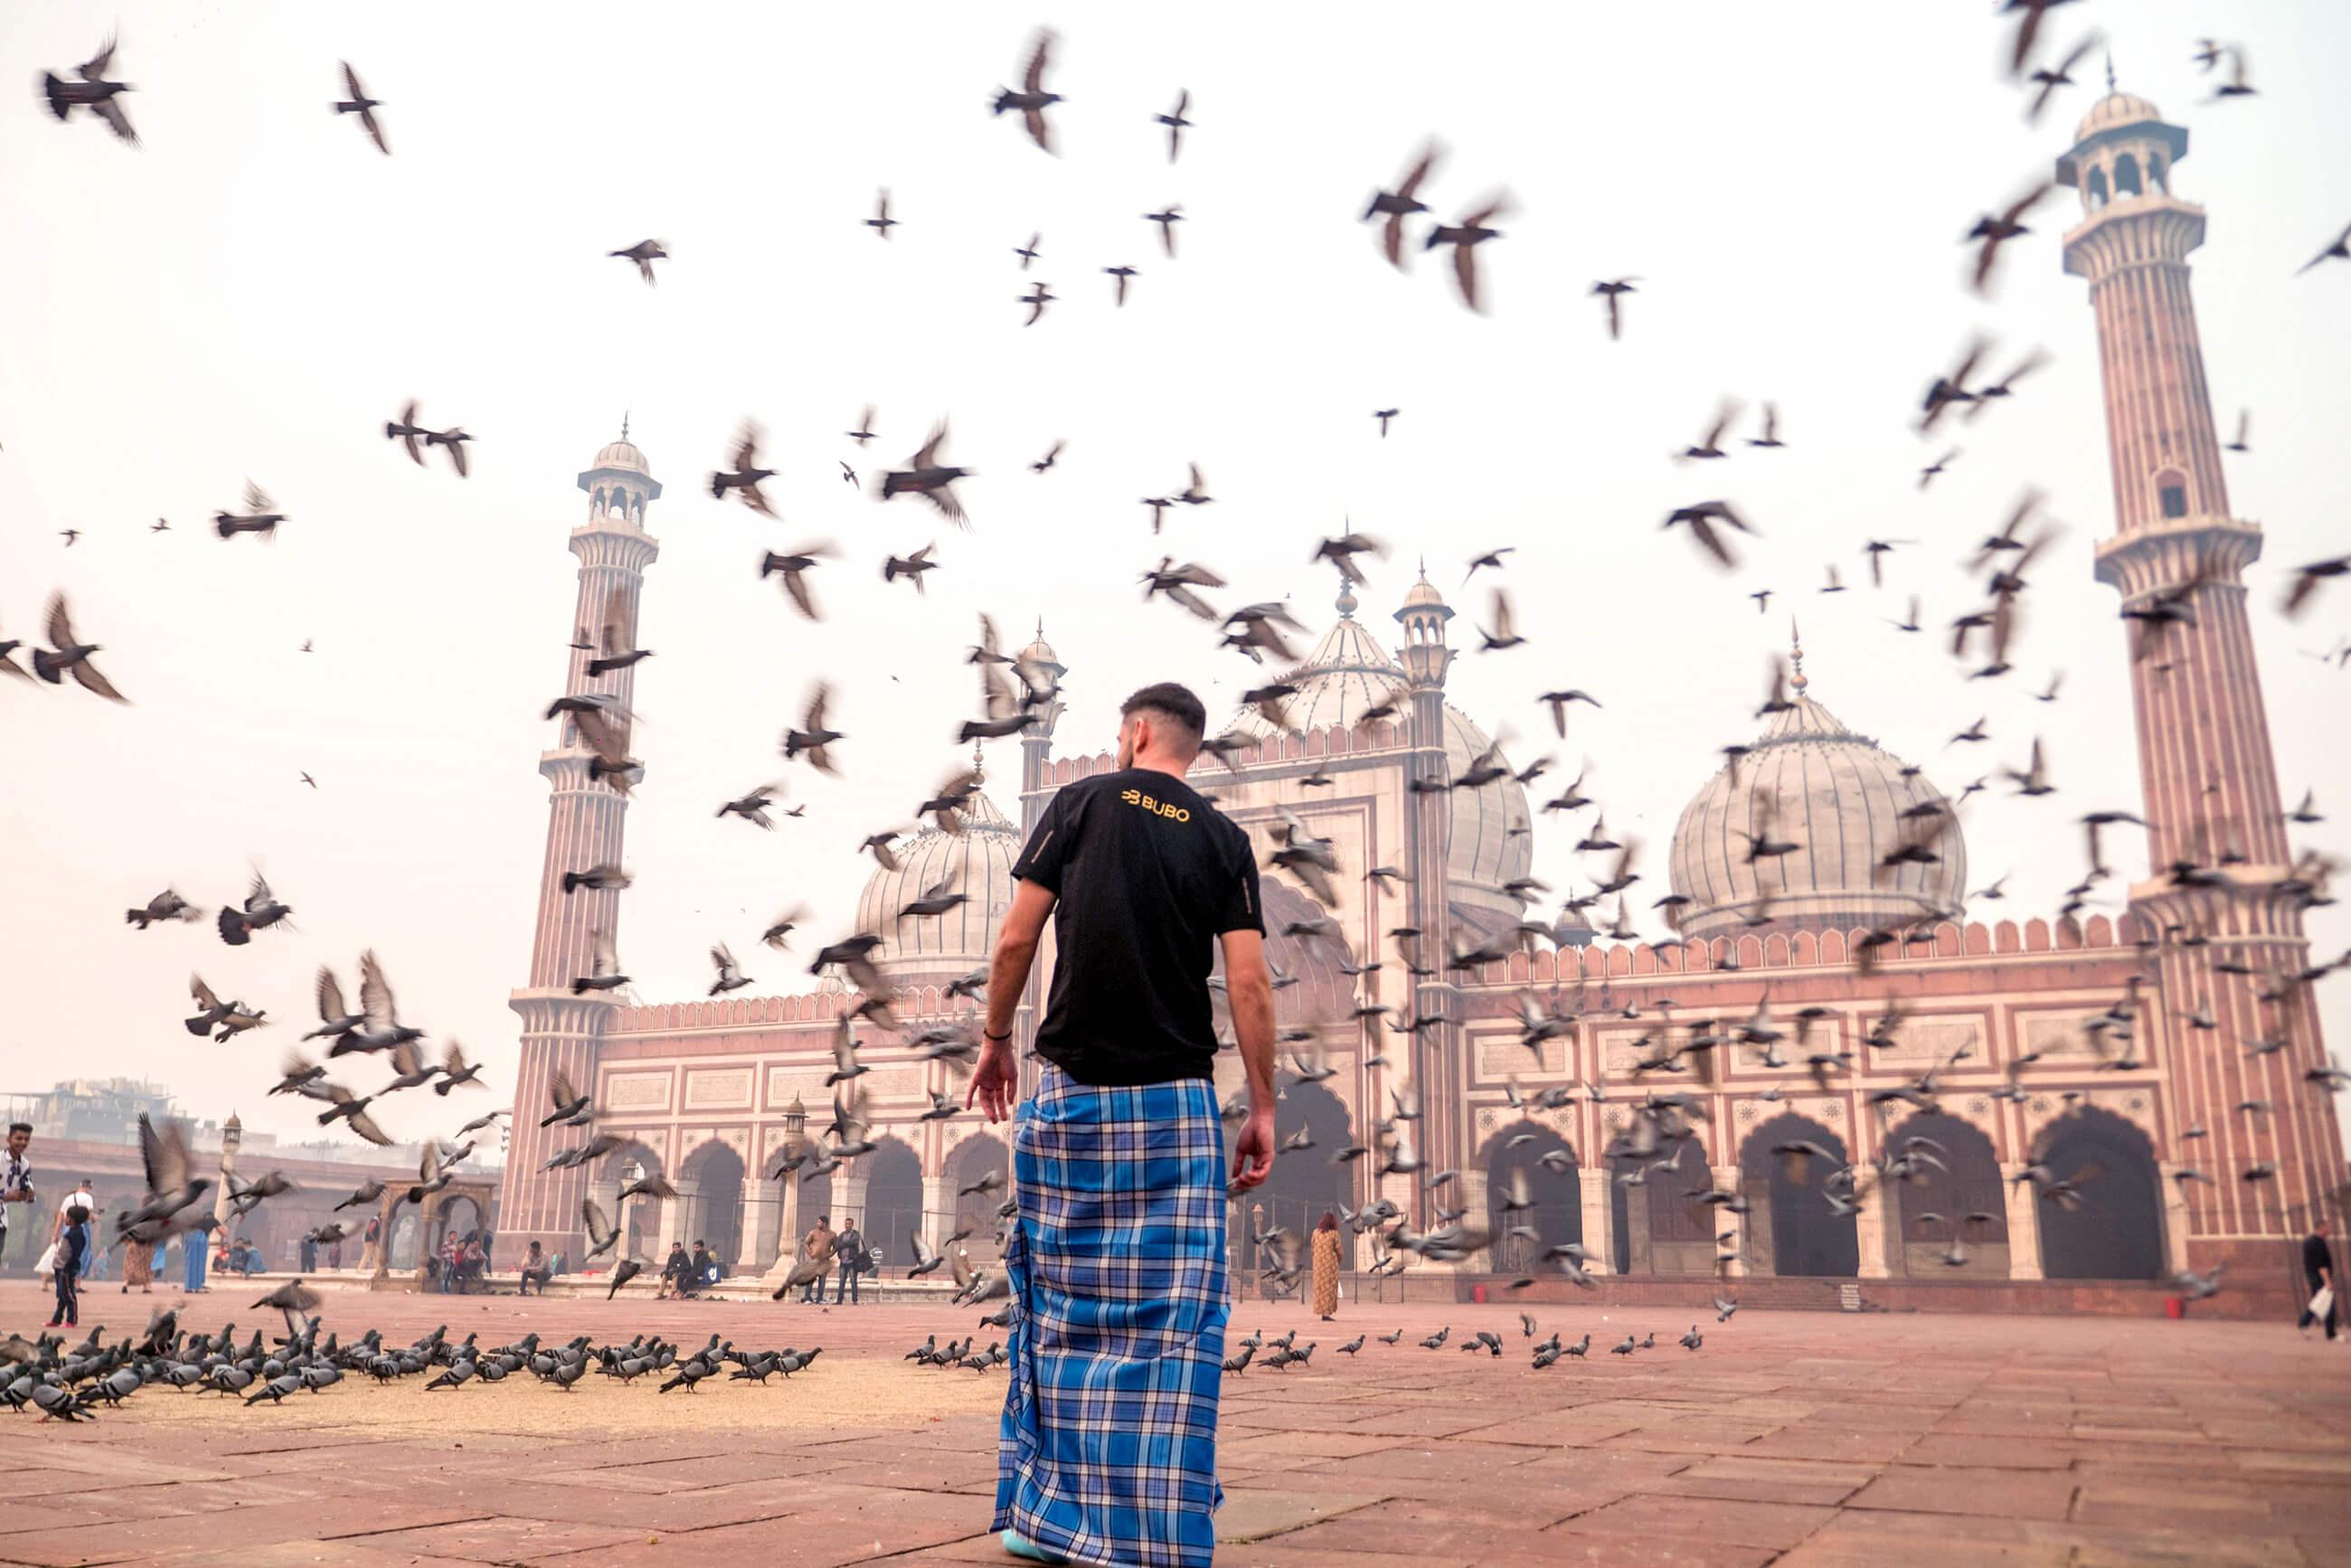 https://bubo.sk/uploads/galleries/4919/martinsimko_india_delhi.jpg